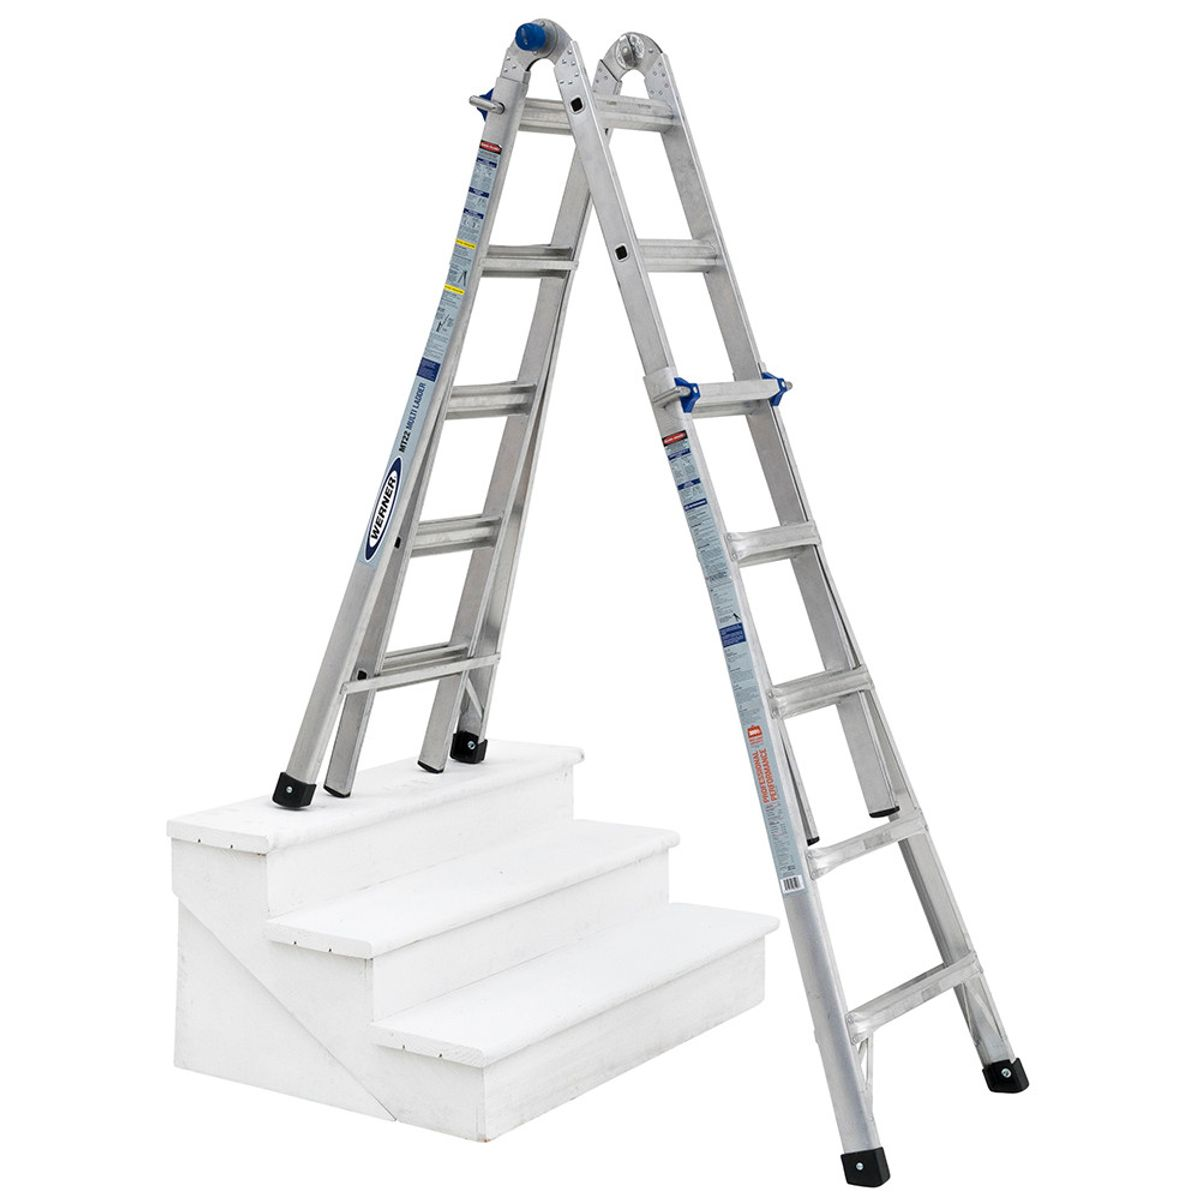 ... MT 22 Multi Purpose Ladders   Werner US ...